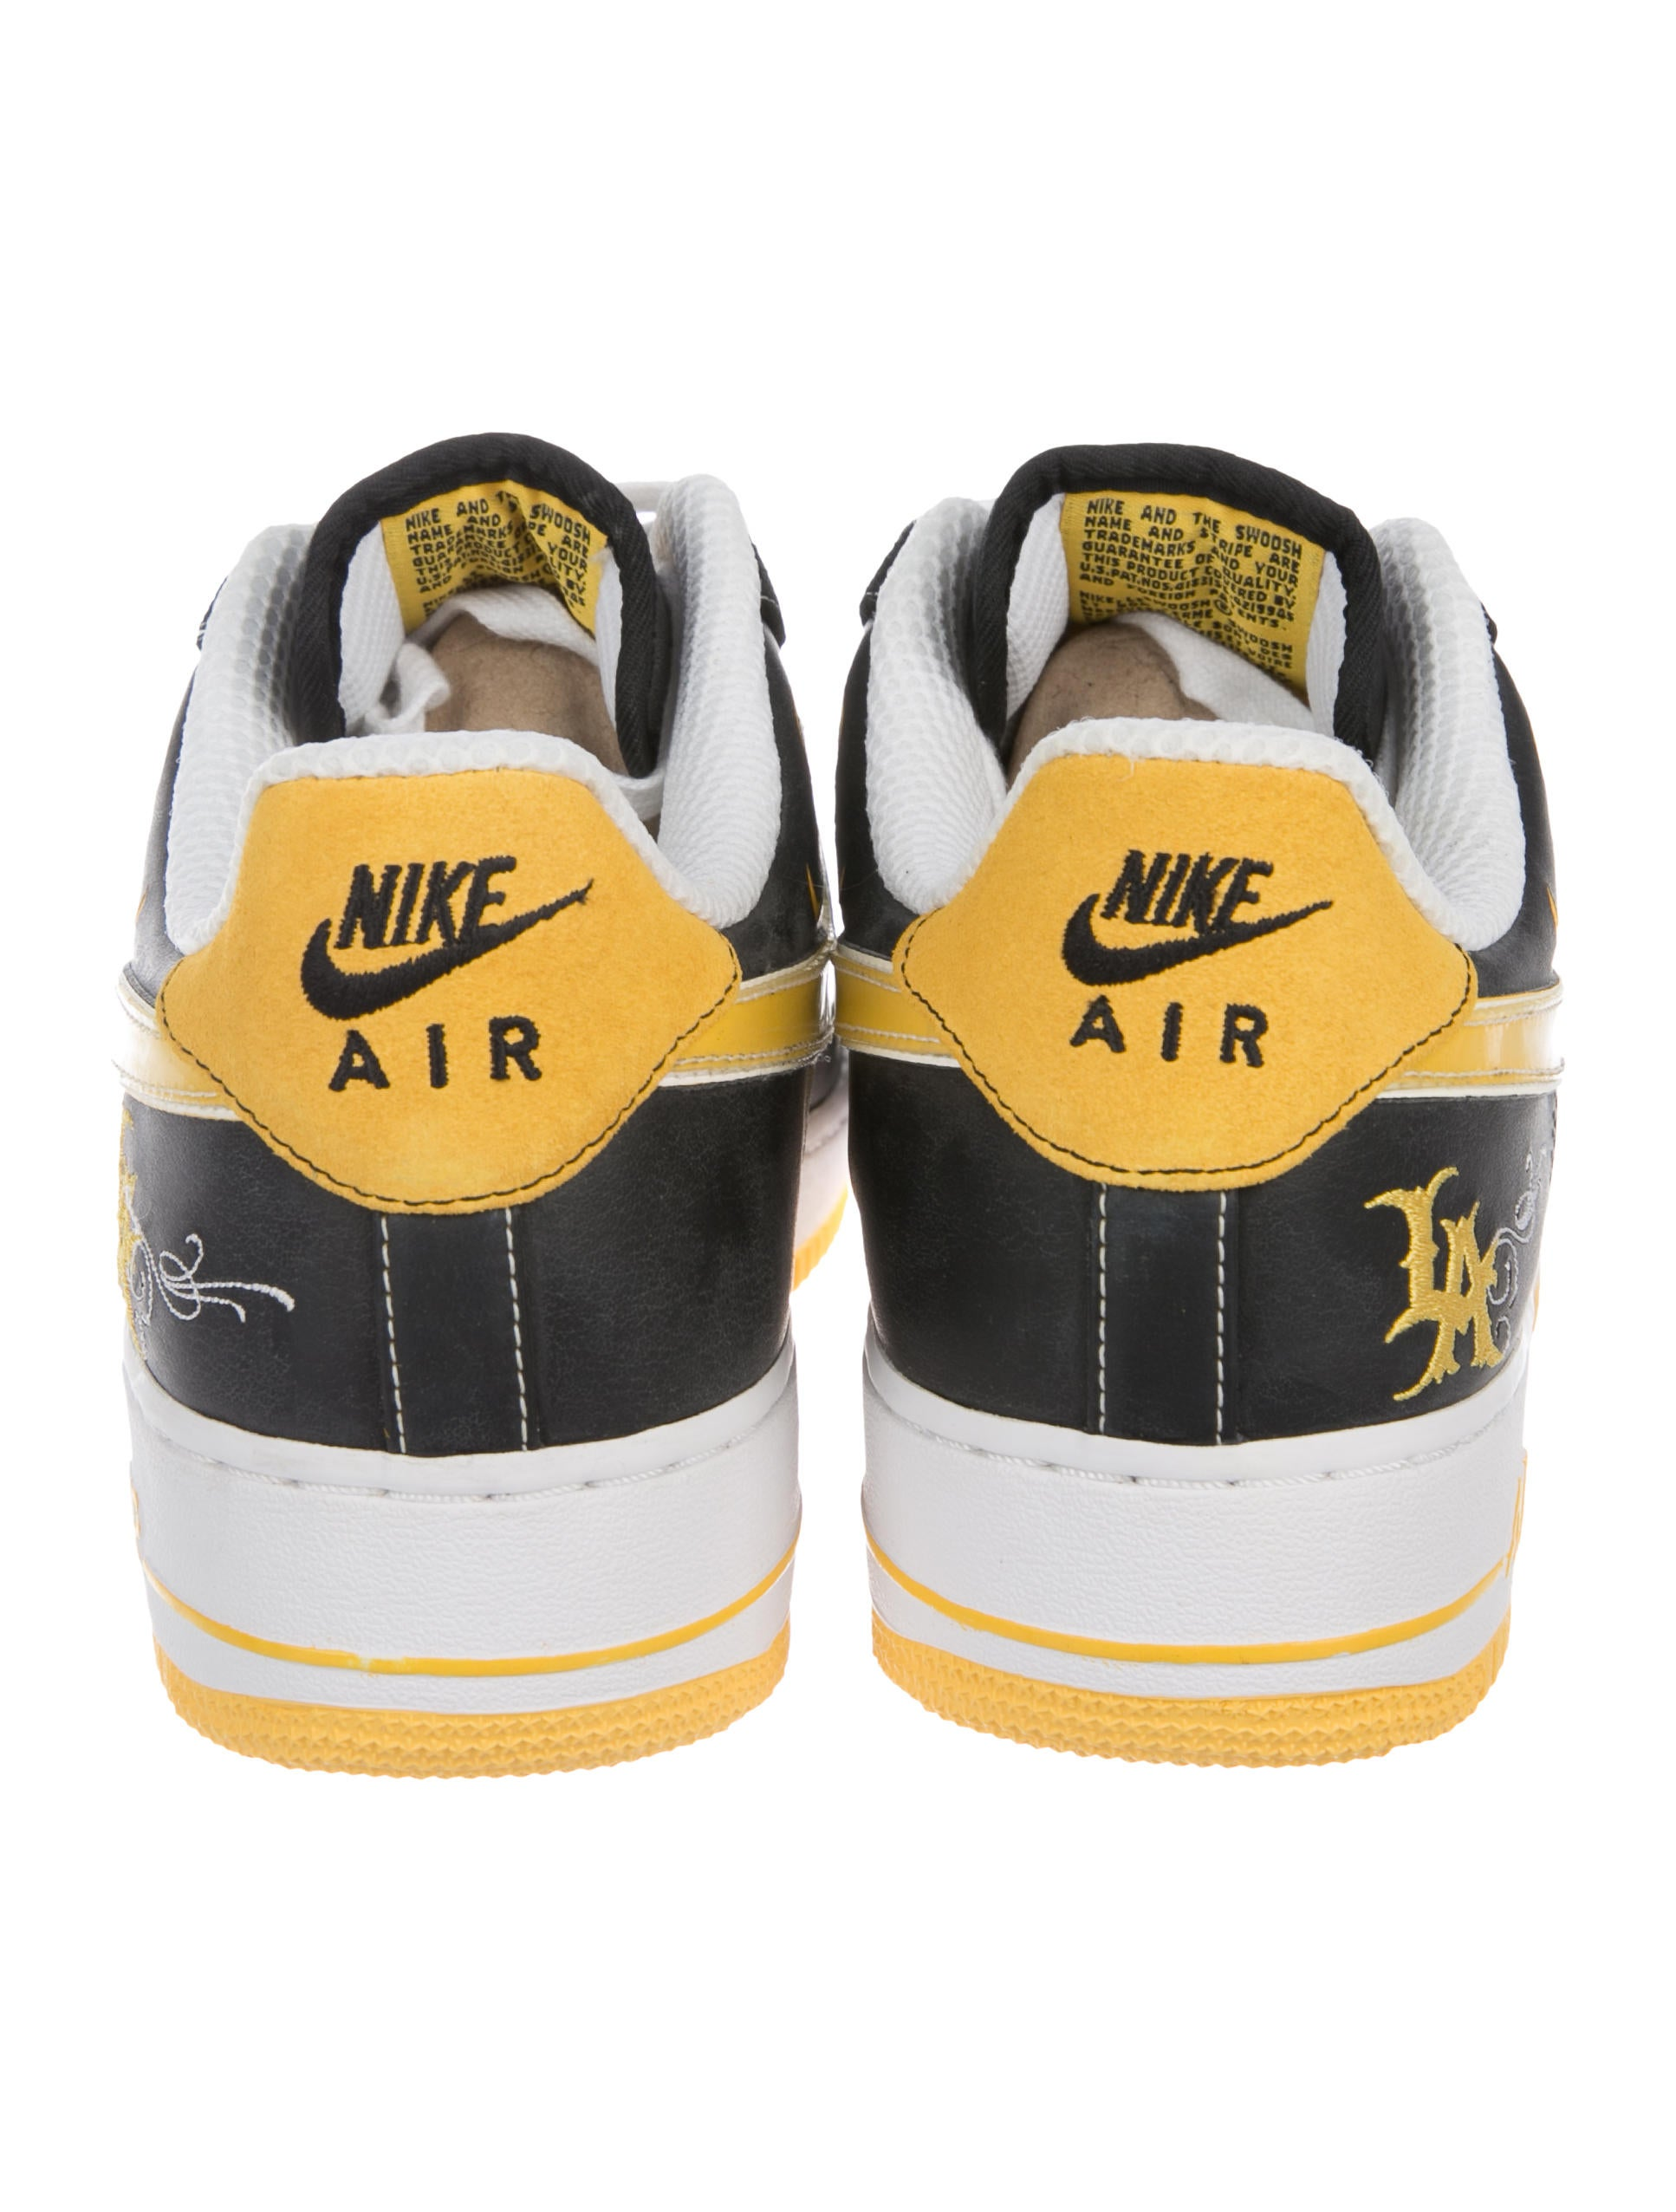 LIVESTRONG x Nike Air Force 1 TZ Mr. Cartoon | SneakerFiles